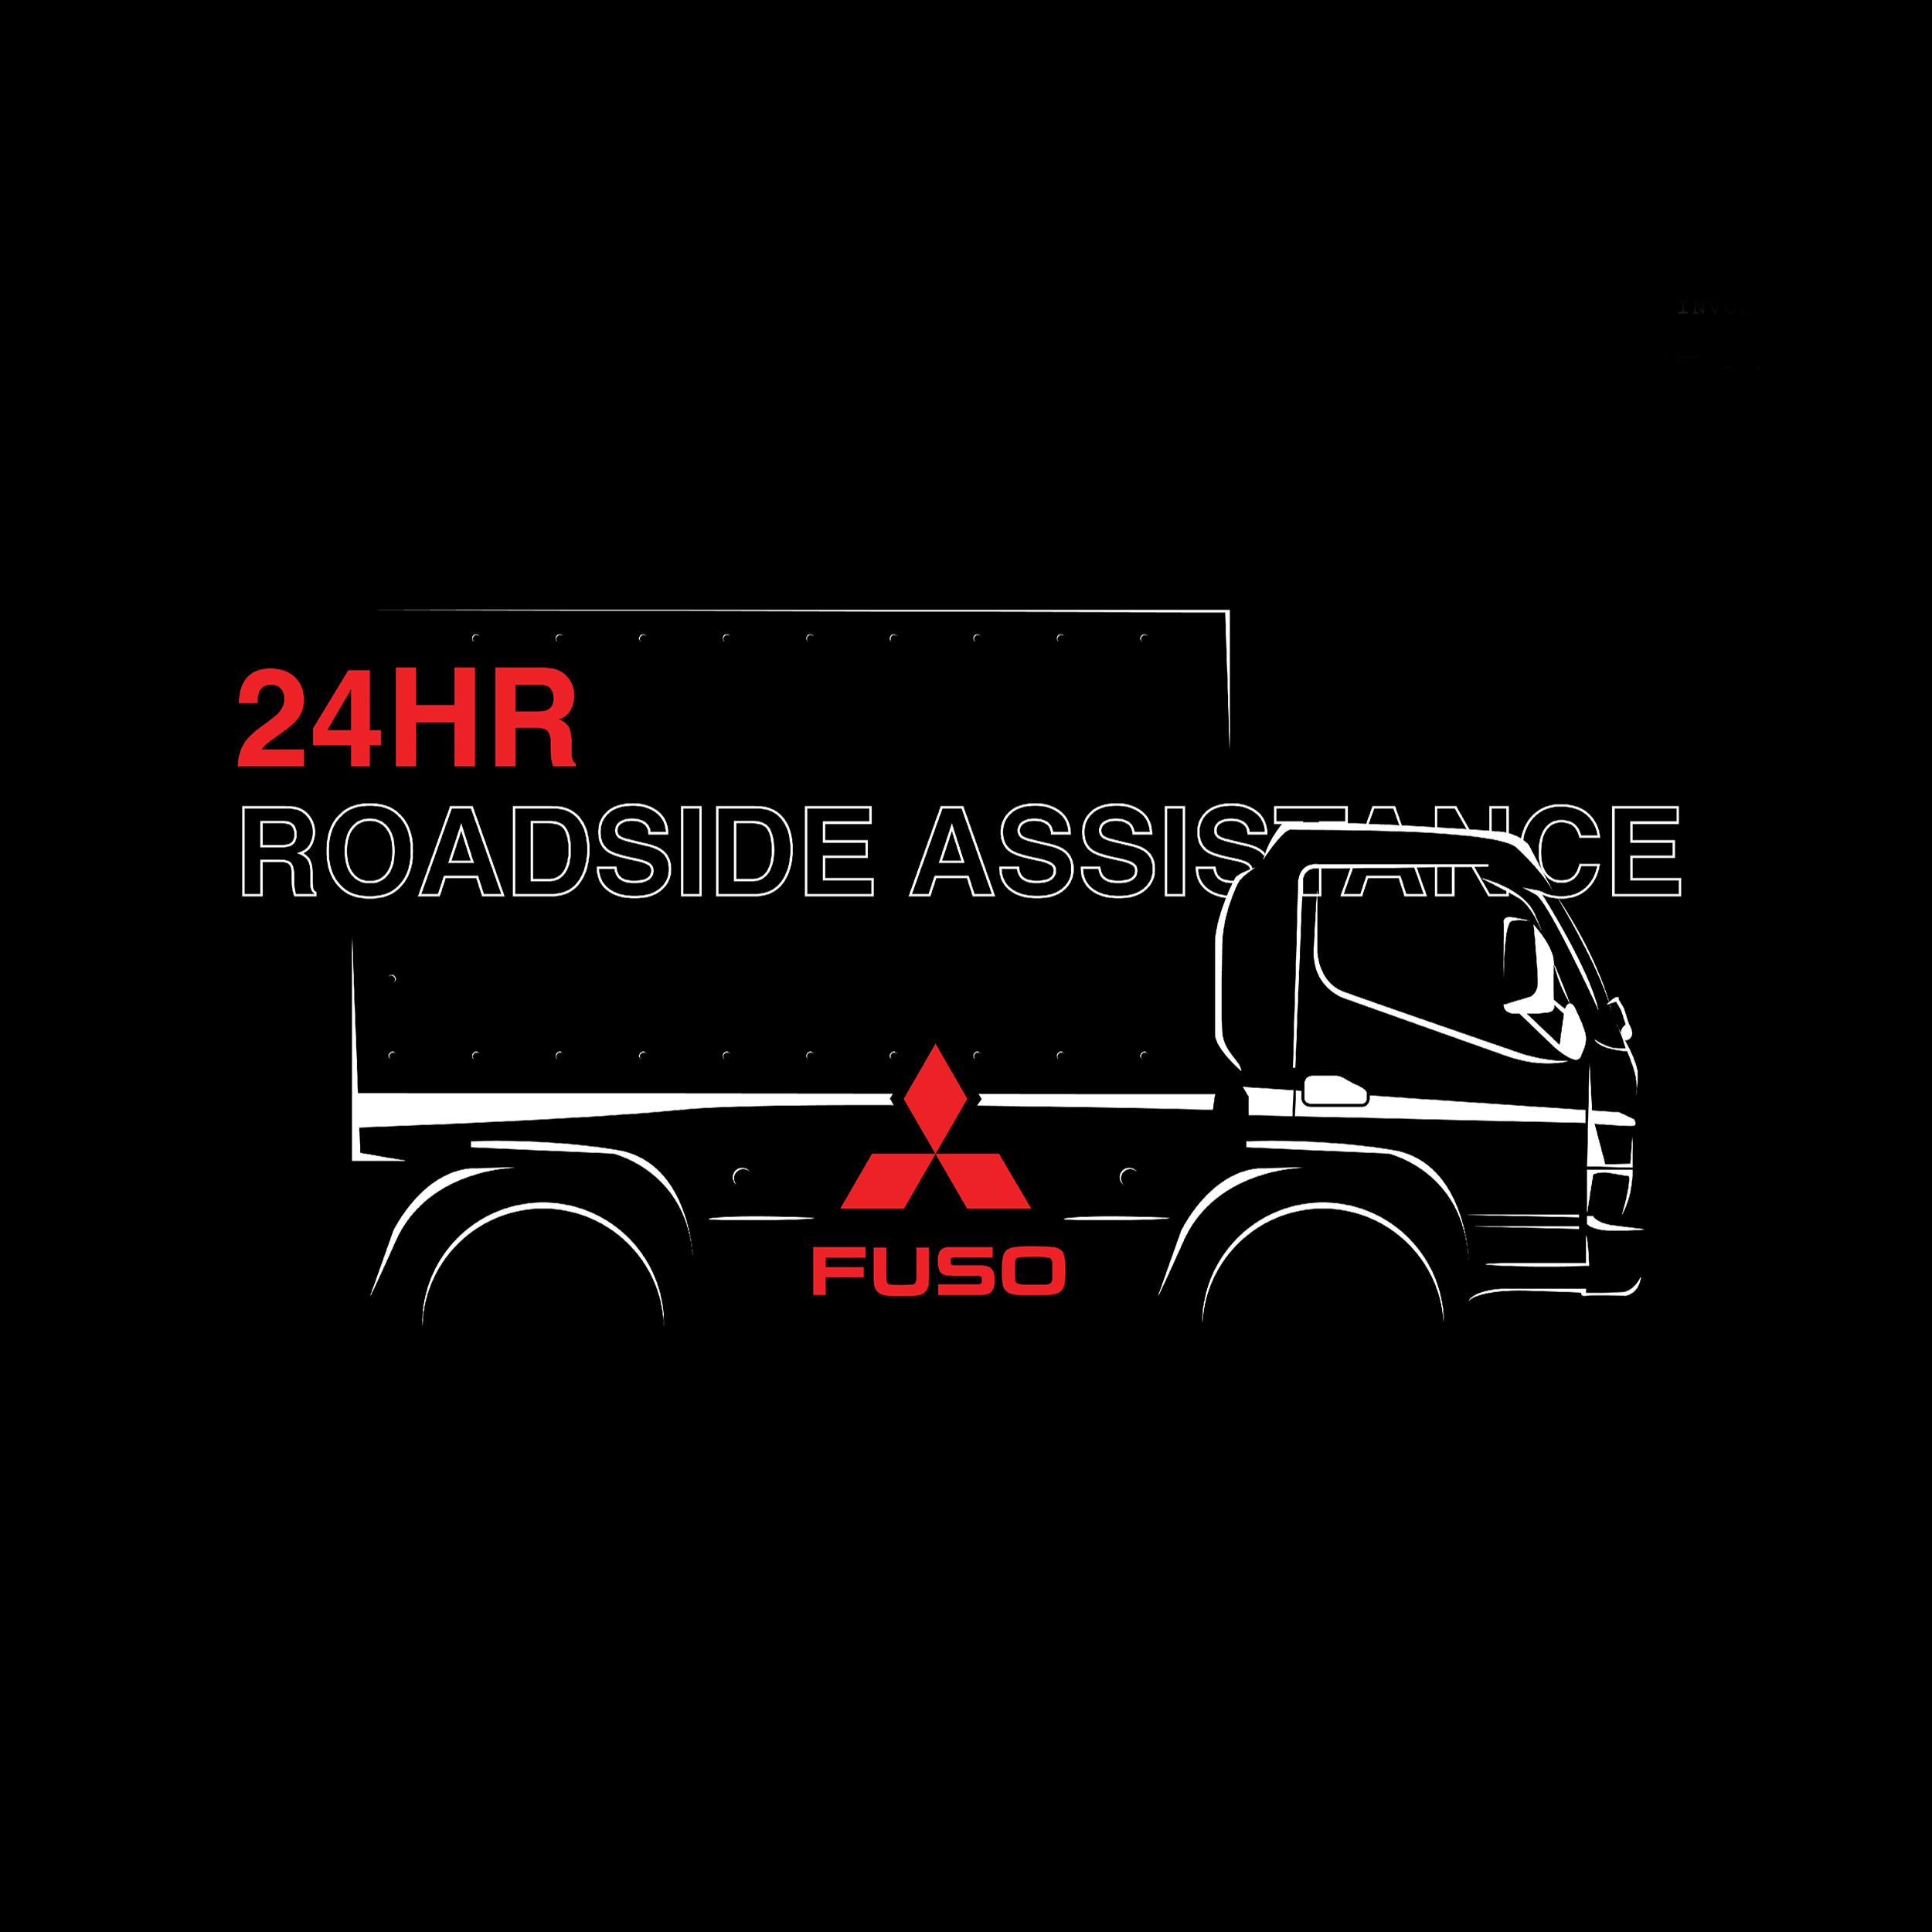 FUSO Trucks 24HR Roadside Assistance Campaign measthead design on illustrated truck